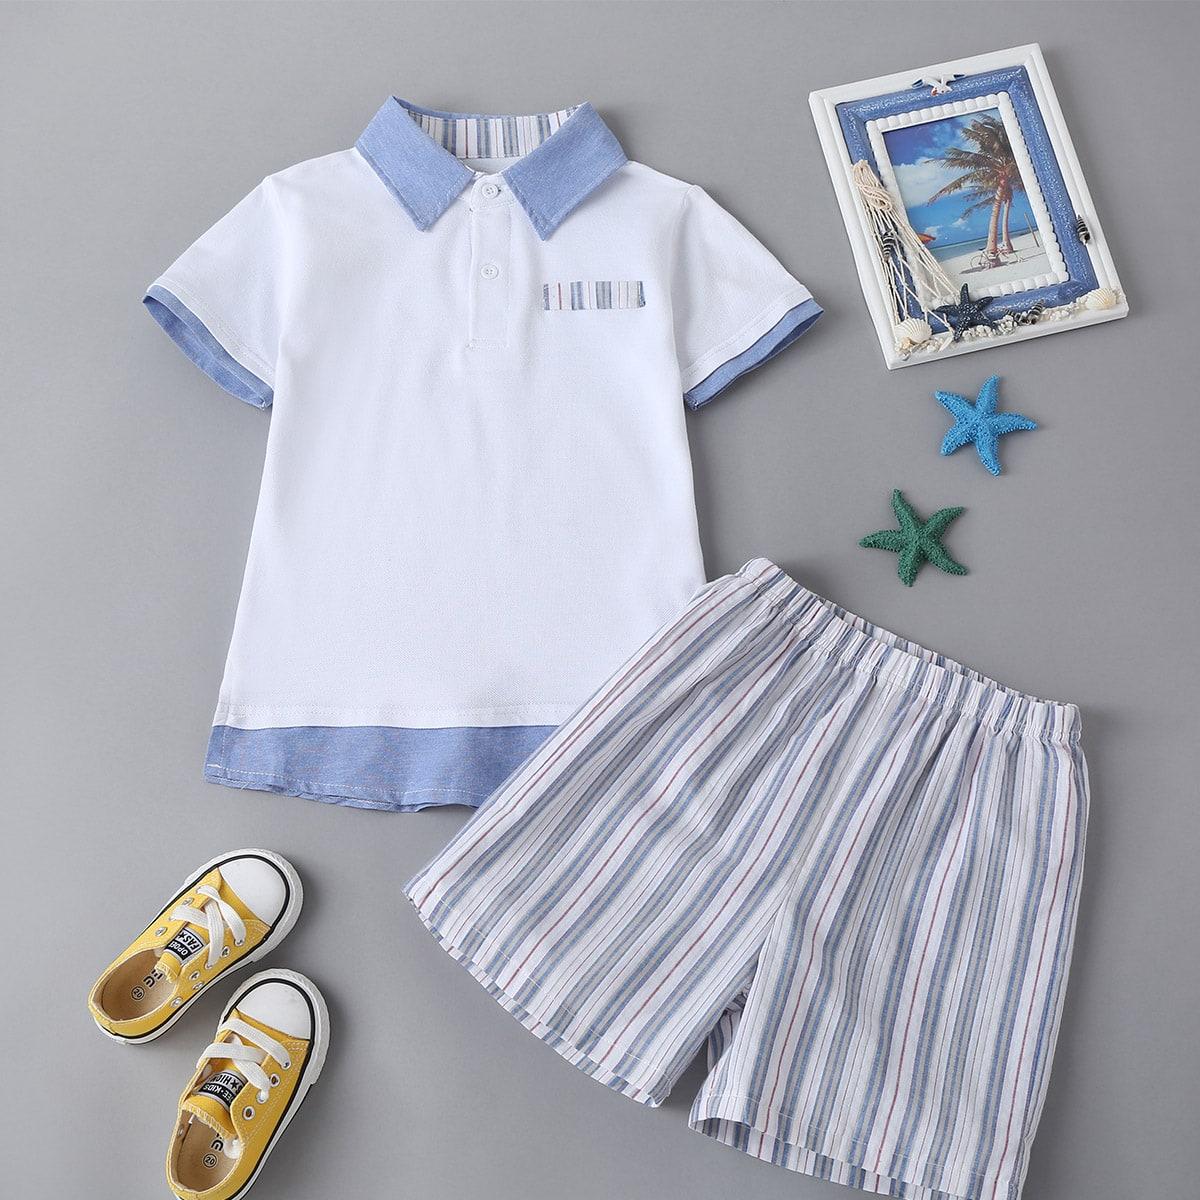 Toddler Boys Polo Neck Tee & Stripe Shorts, SHEIN  - buy with discount